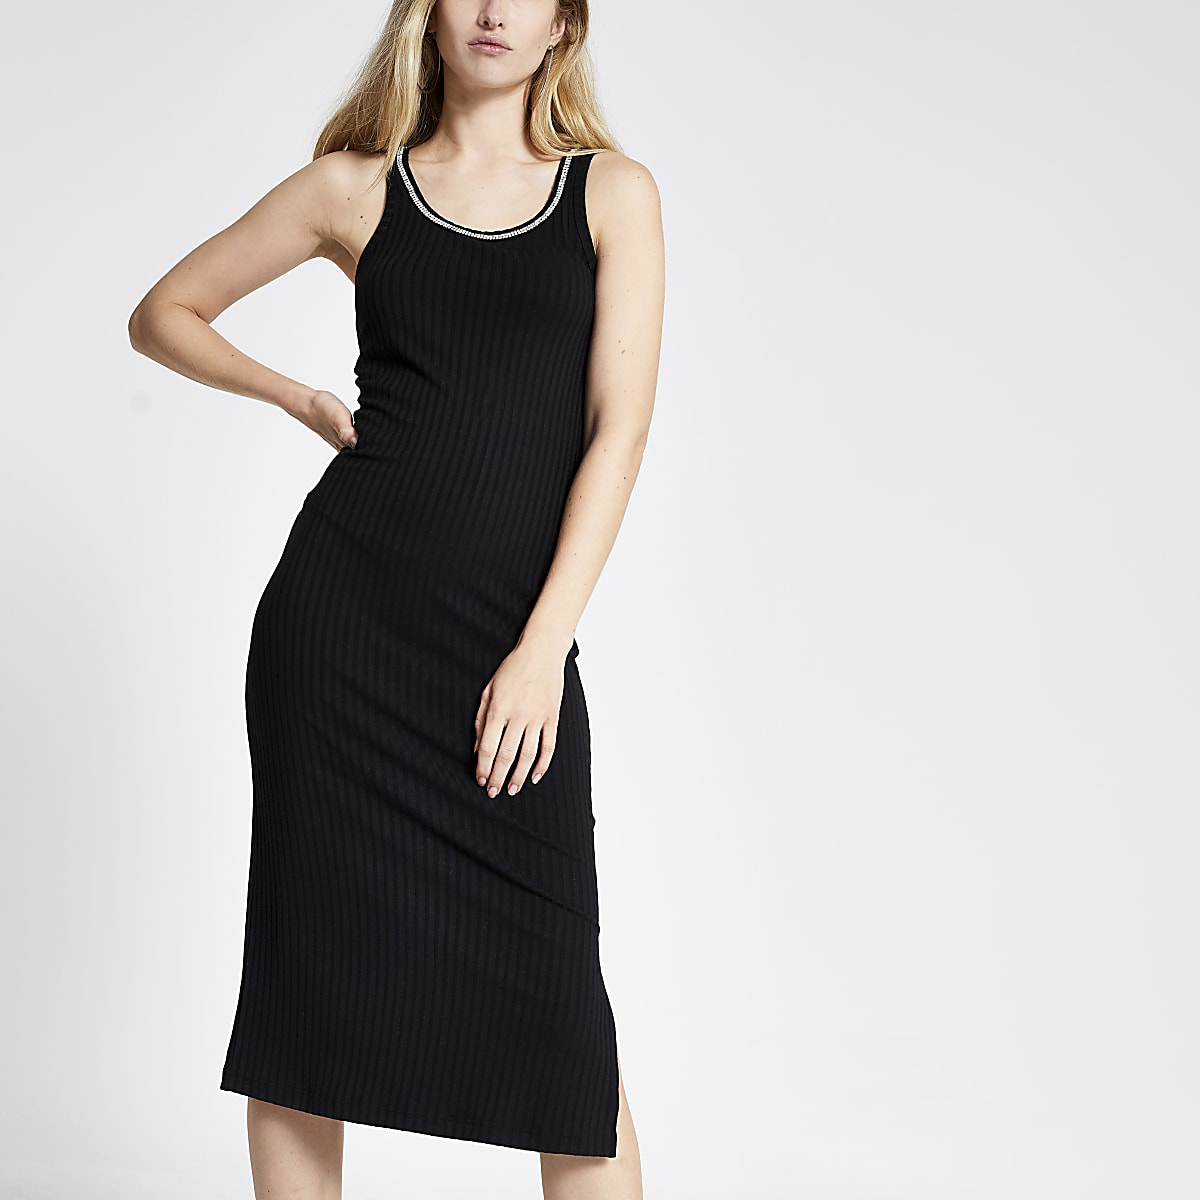 Robe mi-longue ajustée noire bordée de strass